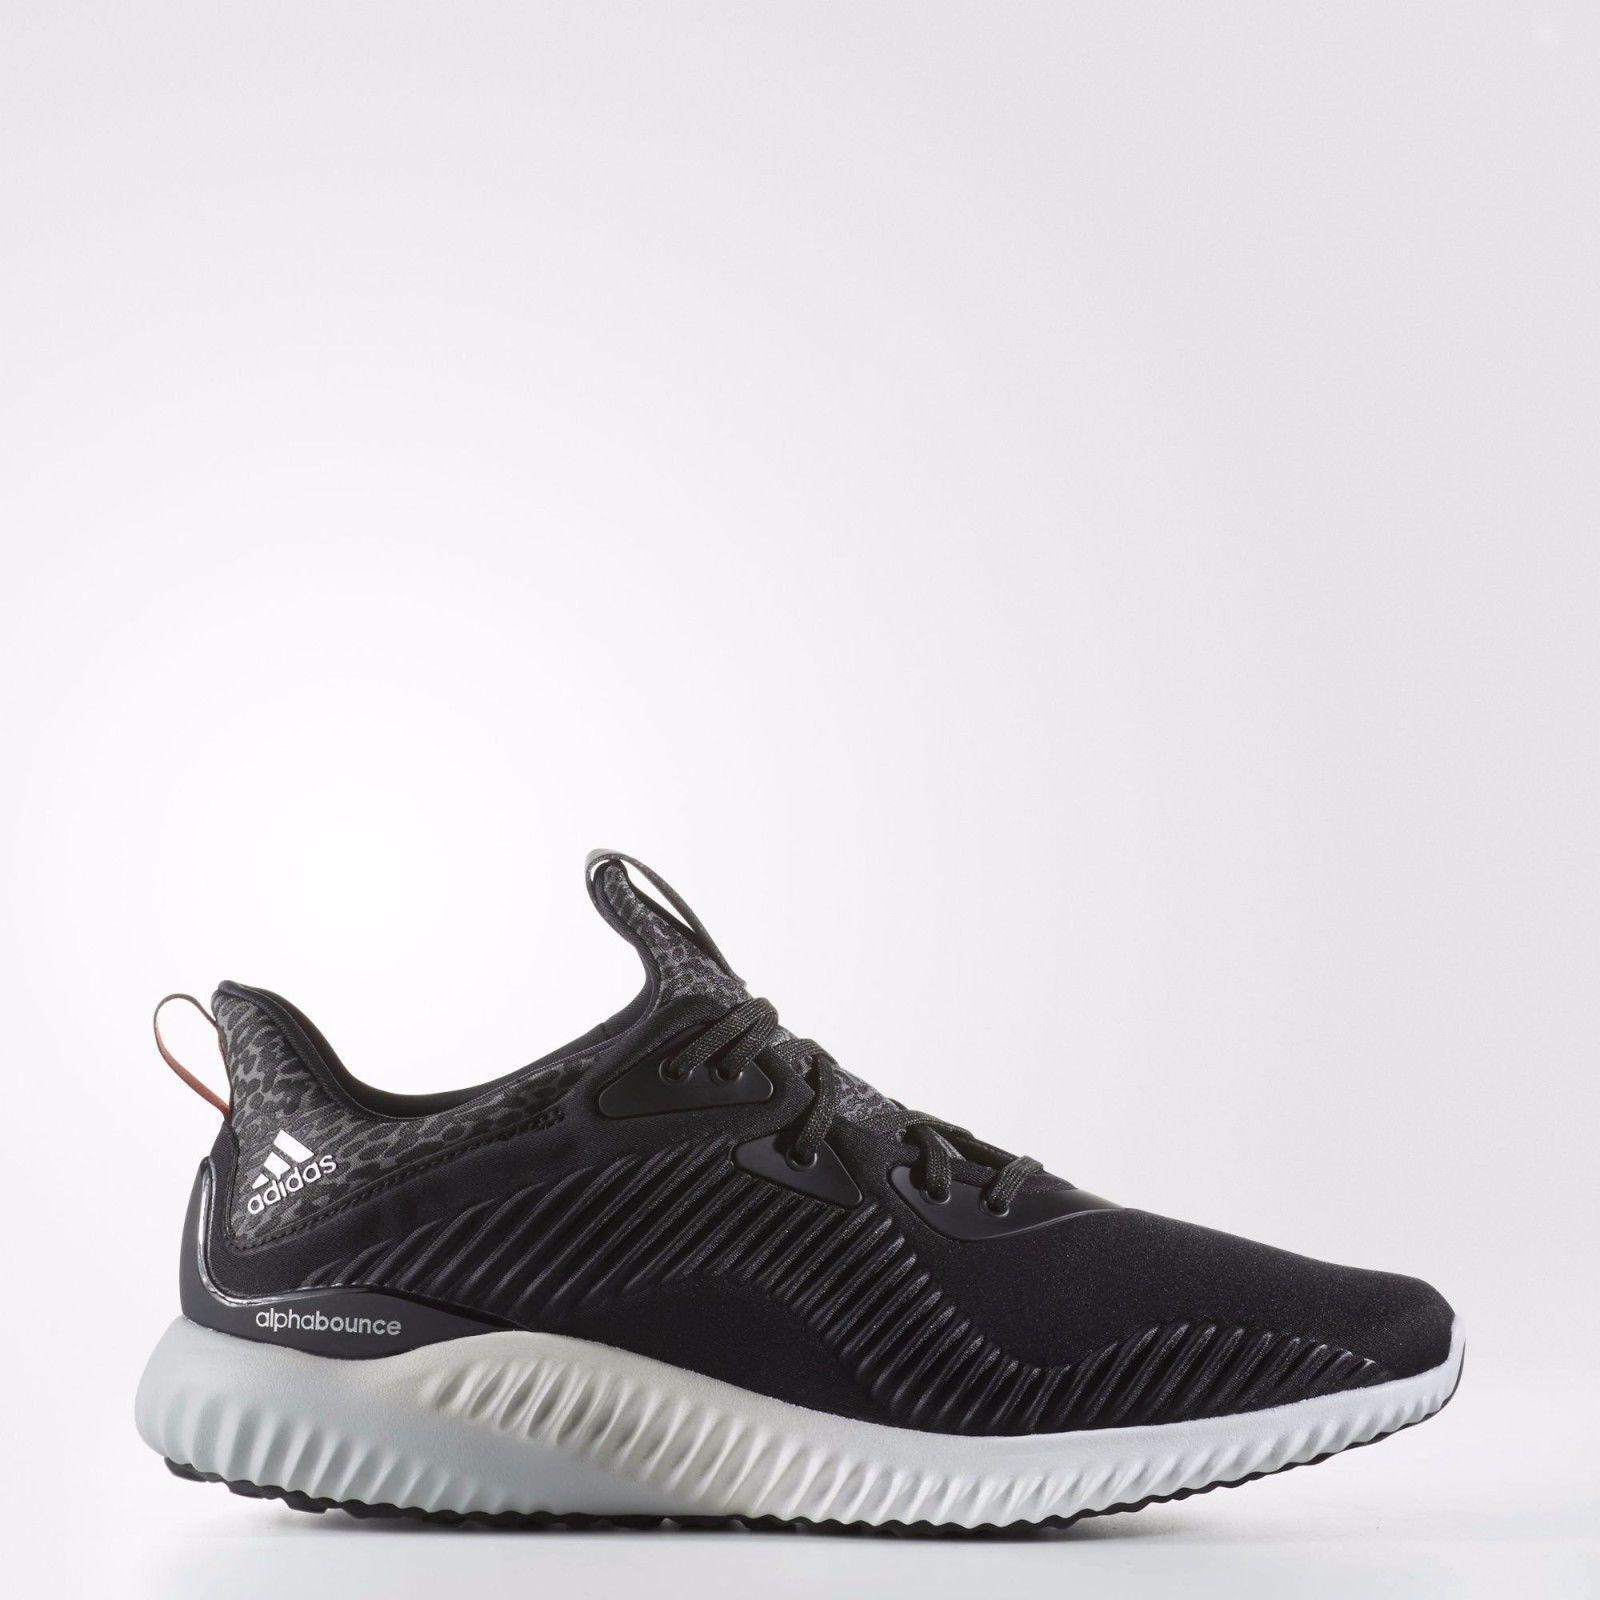 [Adidas] B42744 Sneakers Alpha Bounce Running Shoes Sneakers B42744 Men Women Black 6c95a5